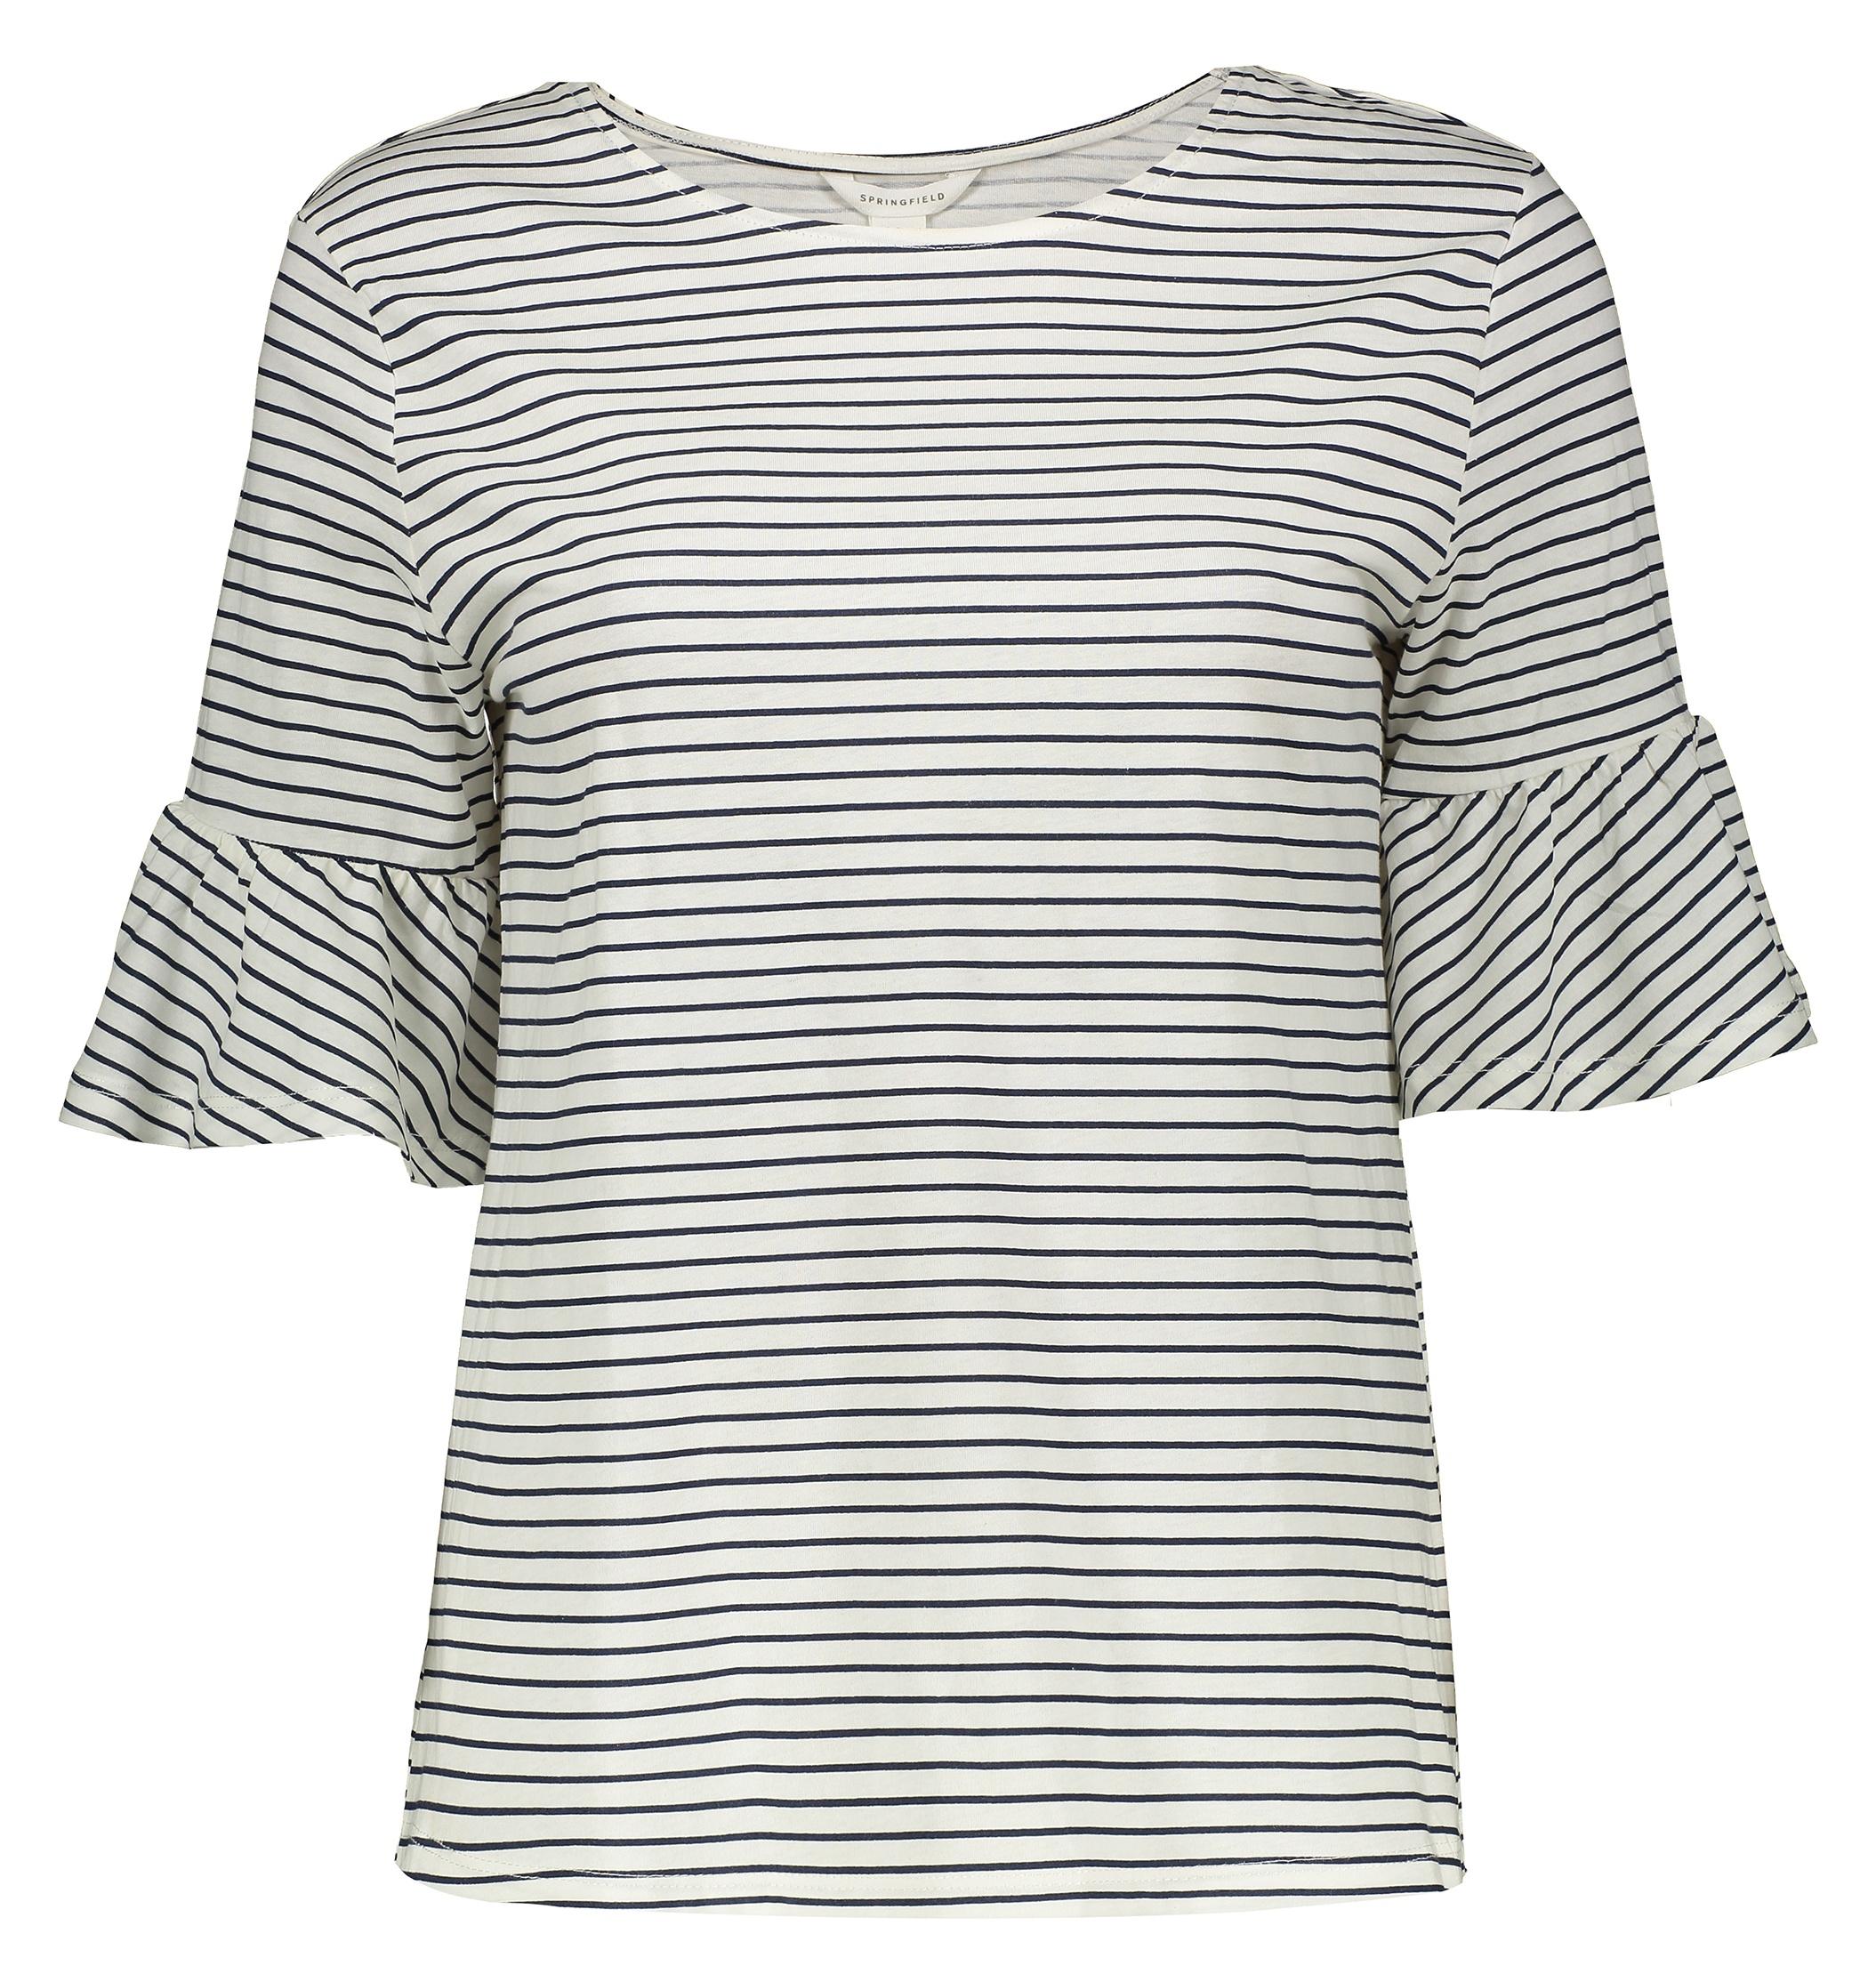 Photo of شرت زنانه اسپرینگ فیلد مدل2736098-IVORY